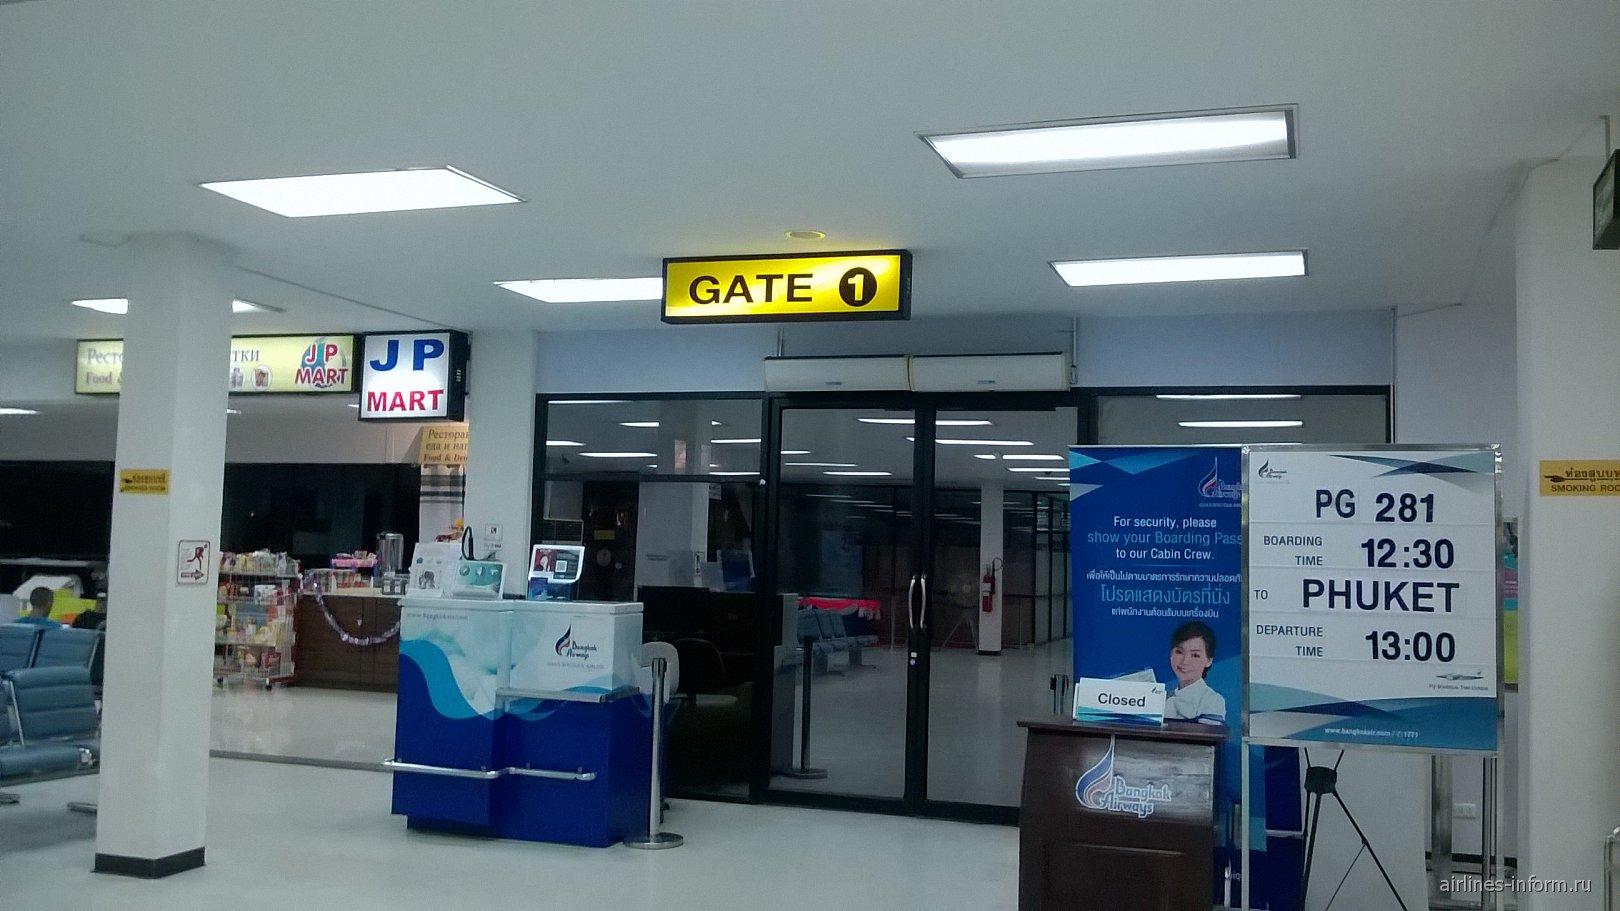 Выход на посадку в аэропорту Утапао